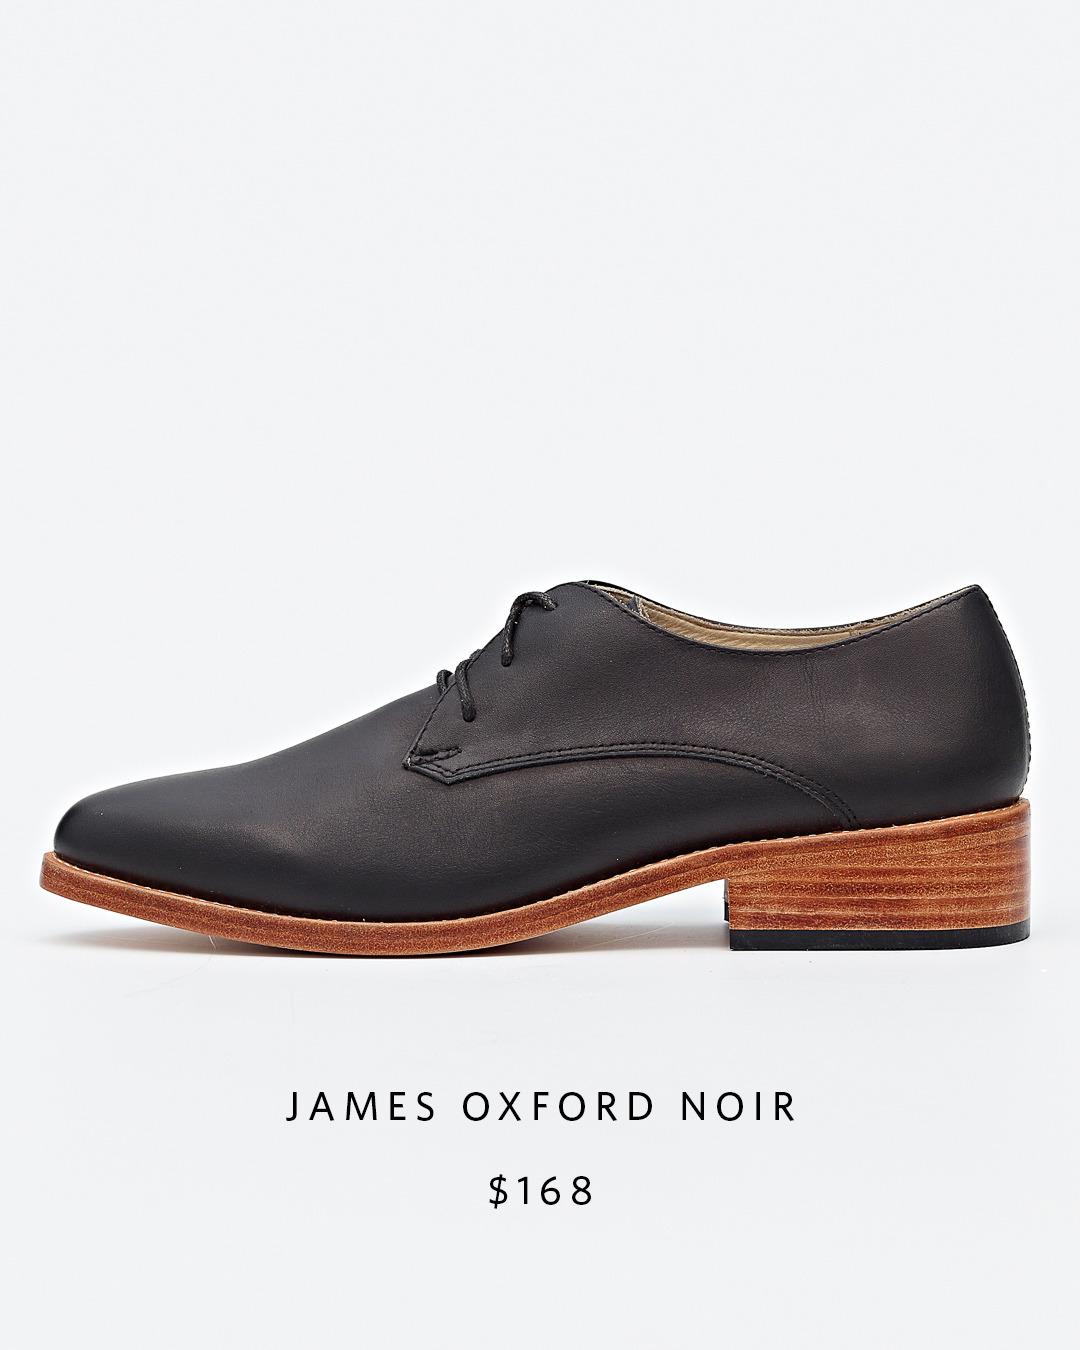 James Oxford Noir   Nisolo